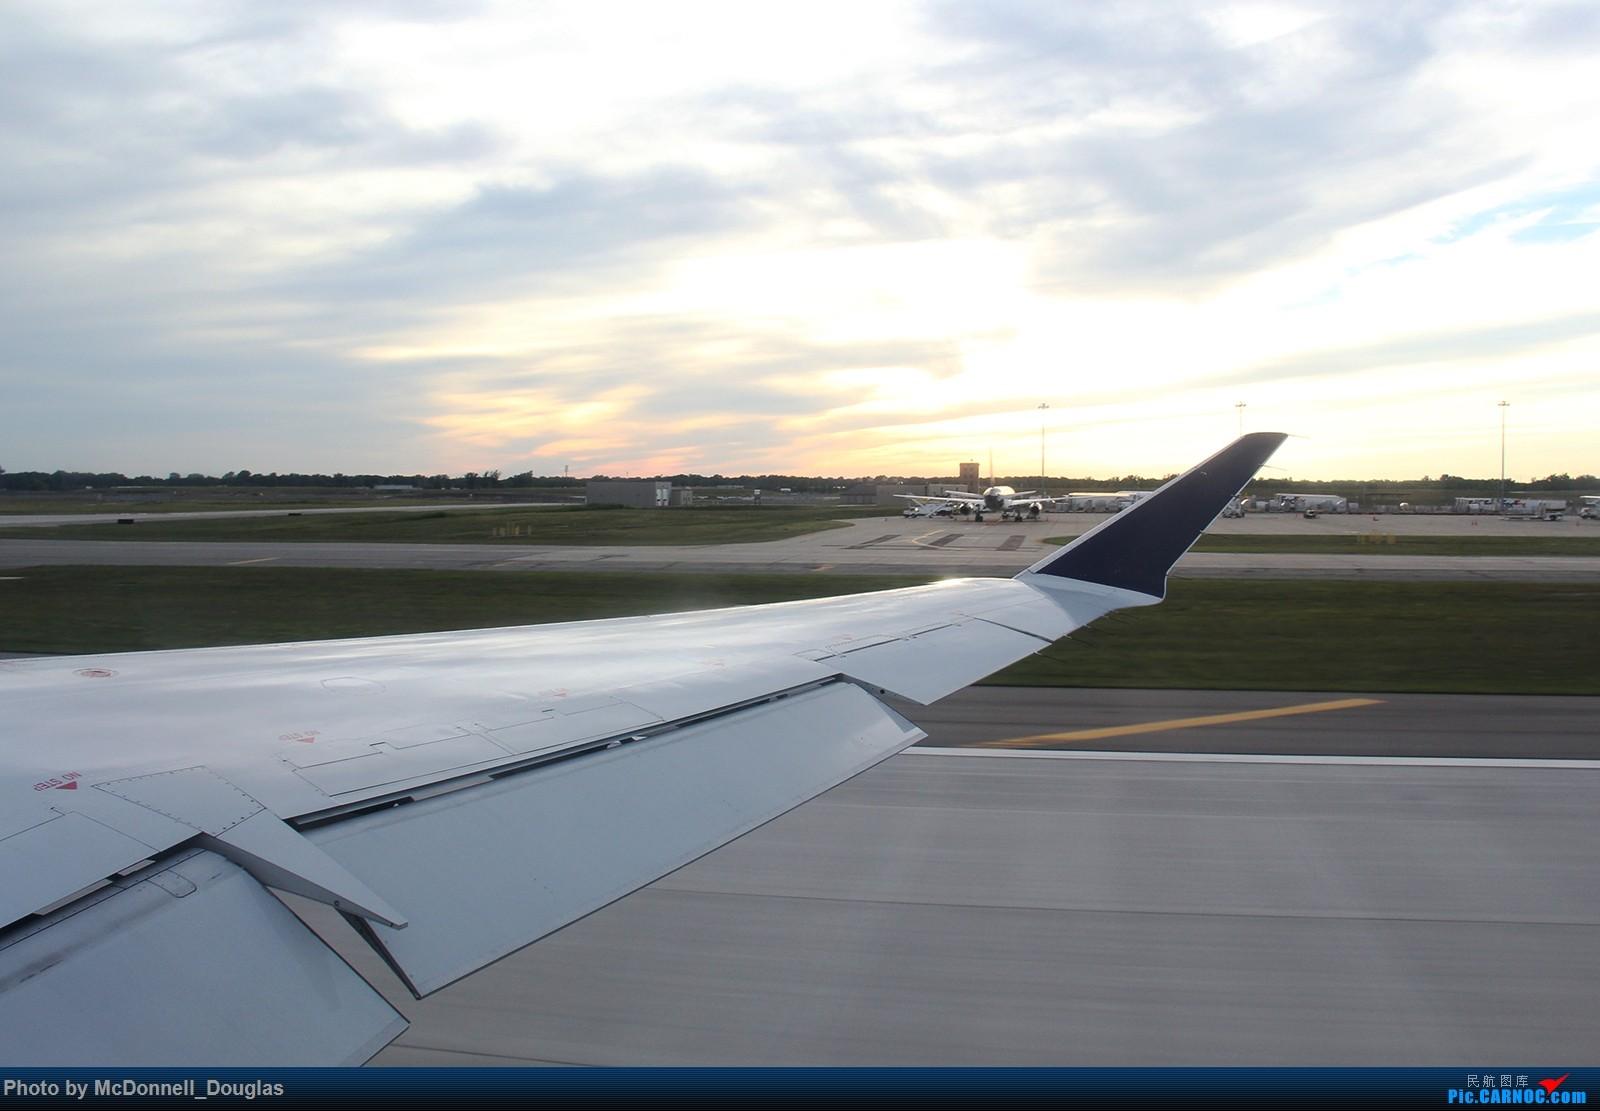 Re:[原创]【上海飞友会】图会很多,也有很多驾驶舱,杂七杂八的美帝,梦寐以求的圣马丁,这更绝不弃贴【驾驶舱已出现】 CANADAIR CL-602-2D24 REGIONAL JET CRJ-900LR N554CA 美国底特律都会韦恩郡机场